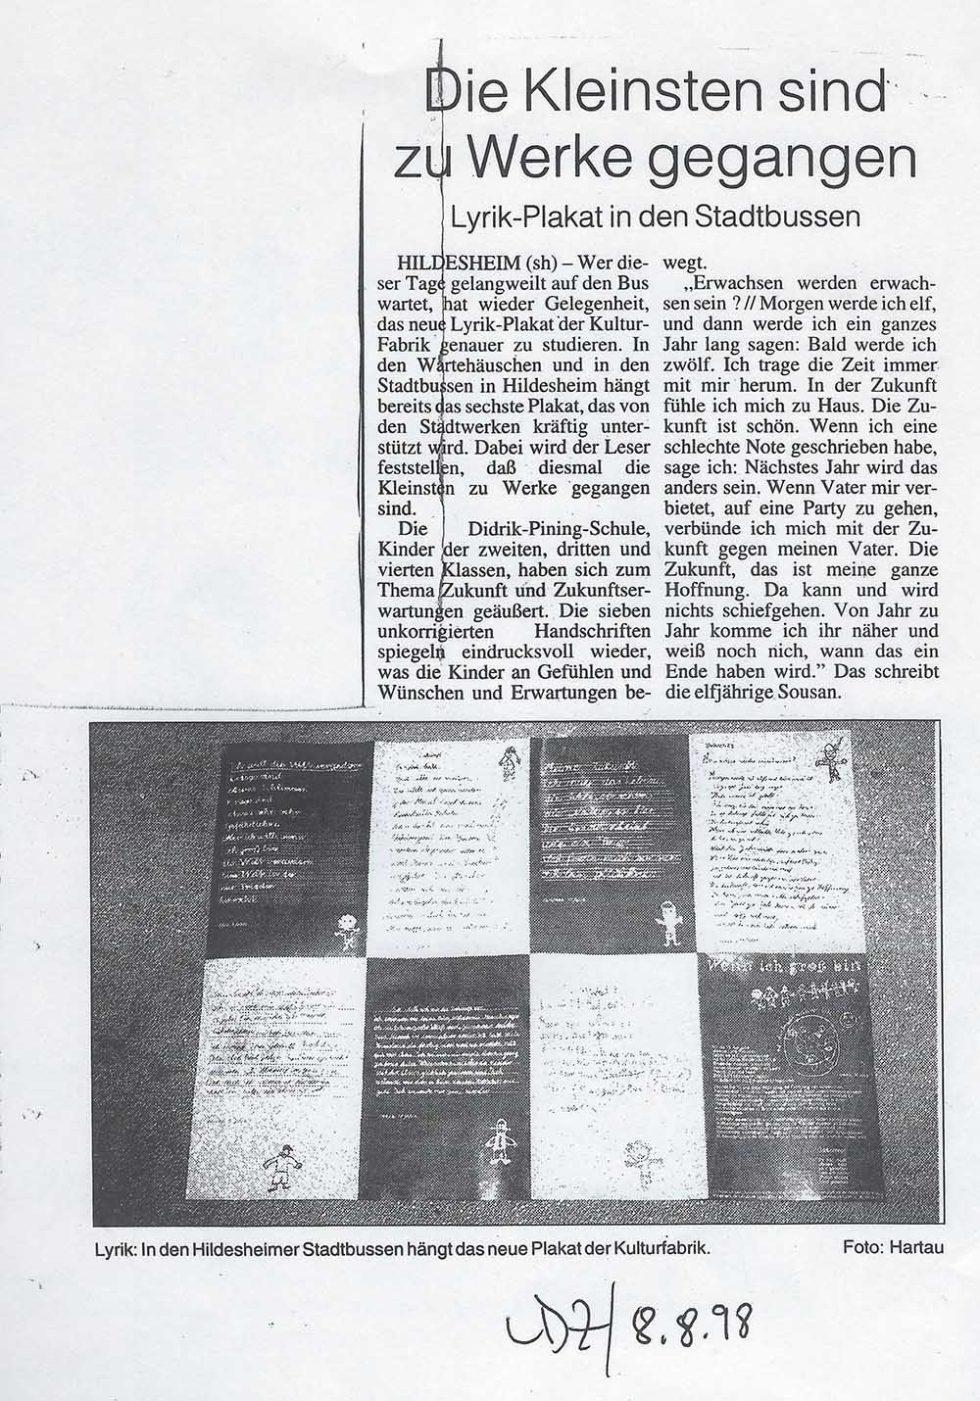 KehrwiederSchulprojekt1998_8.8.98